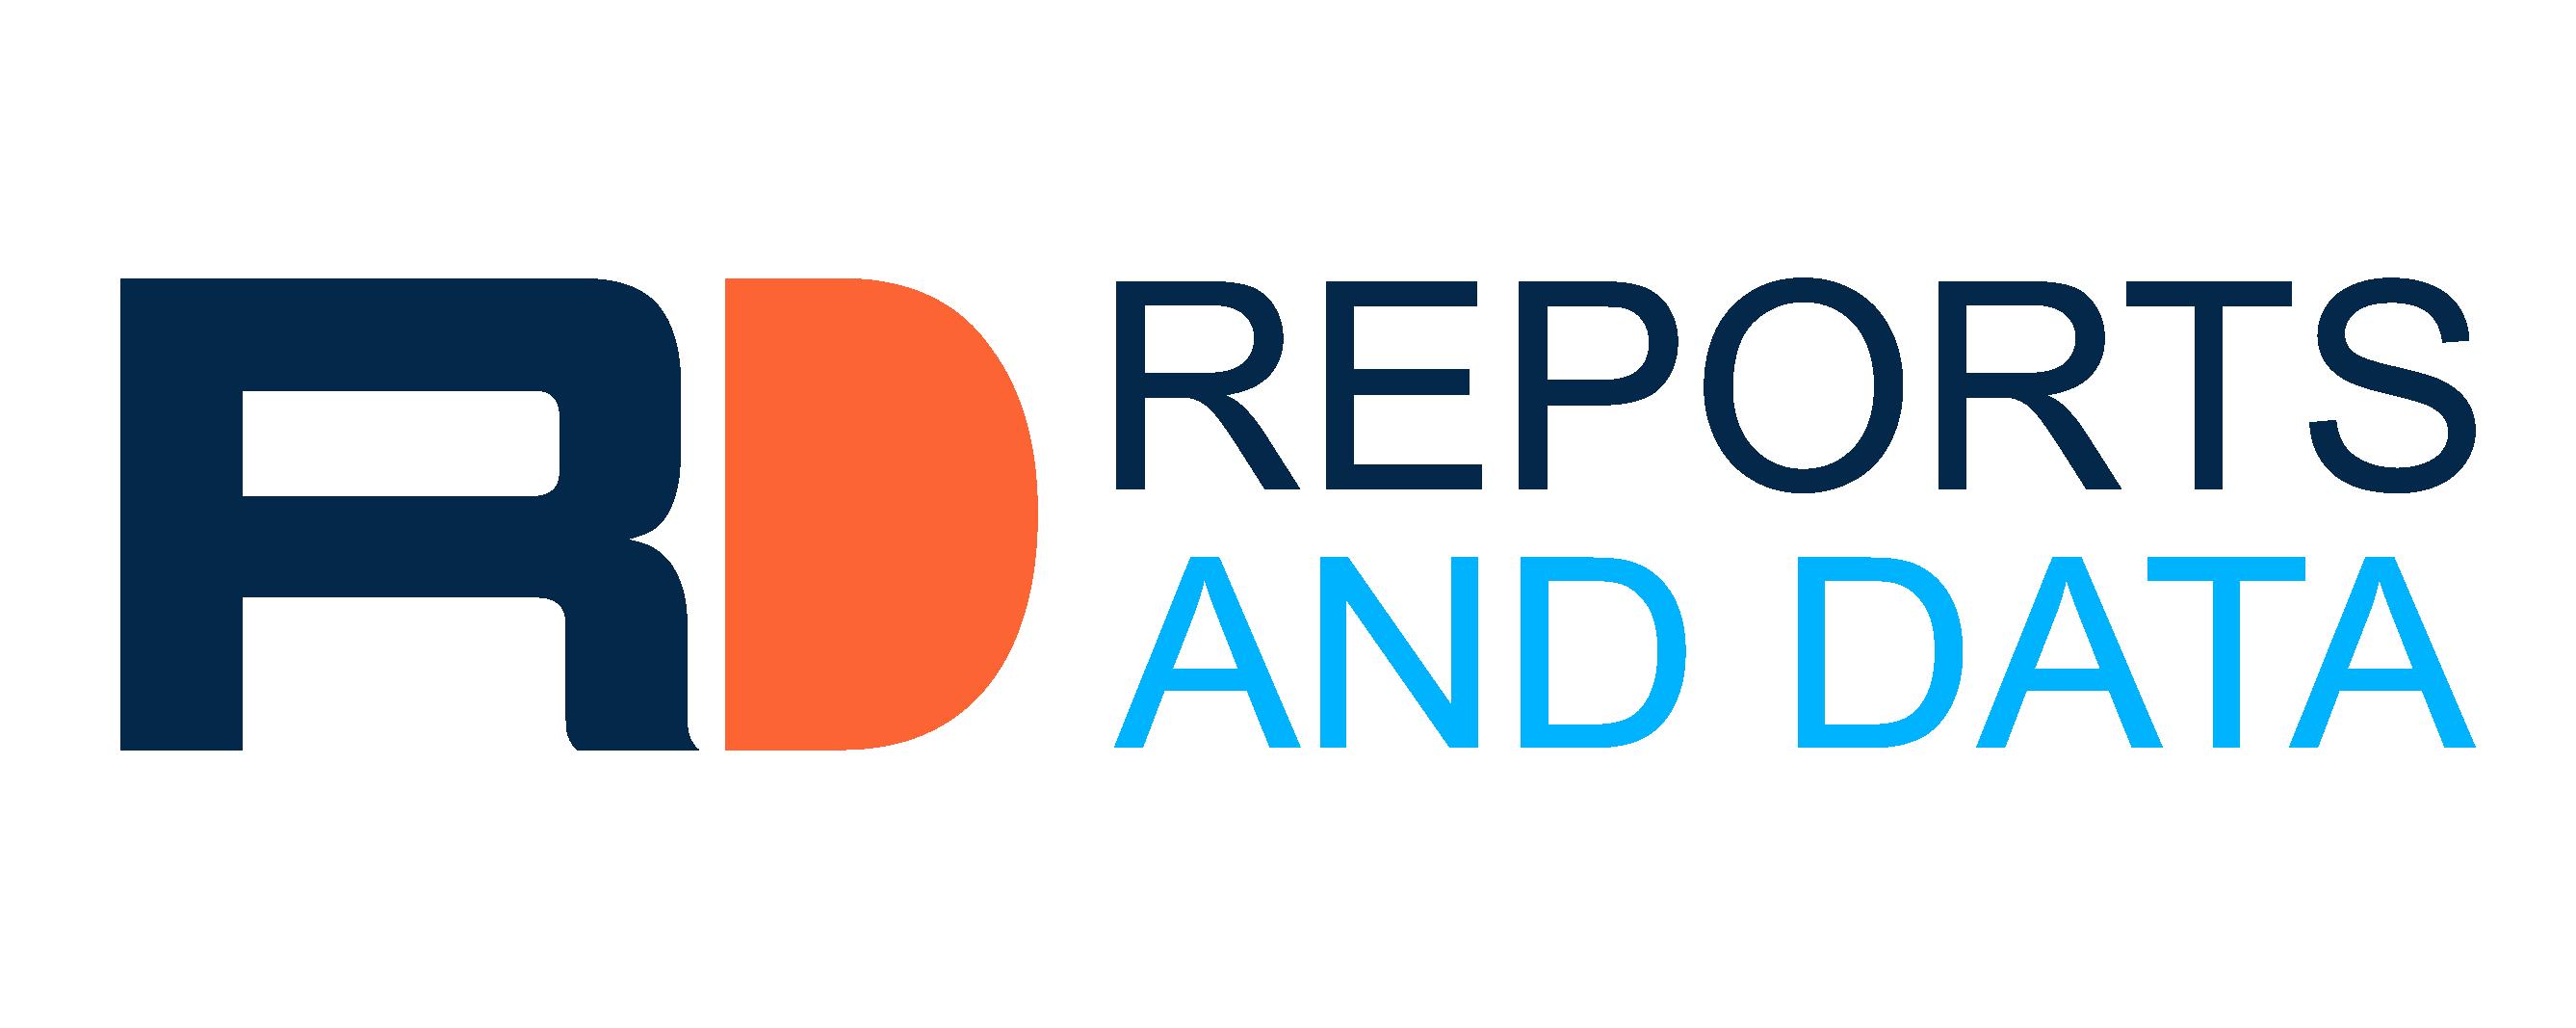 Cognitive Assessment and Training in Healthcare Market Demand, Outlook and Forecast to 2026   Top Key Players - Bracket, Cambridge Cognition Ltd., Quest Diagnostics, Medavante Inc., Neurocog Trials